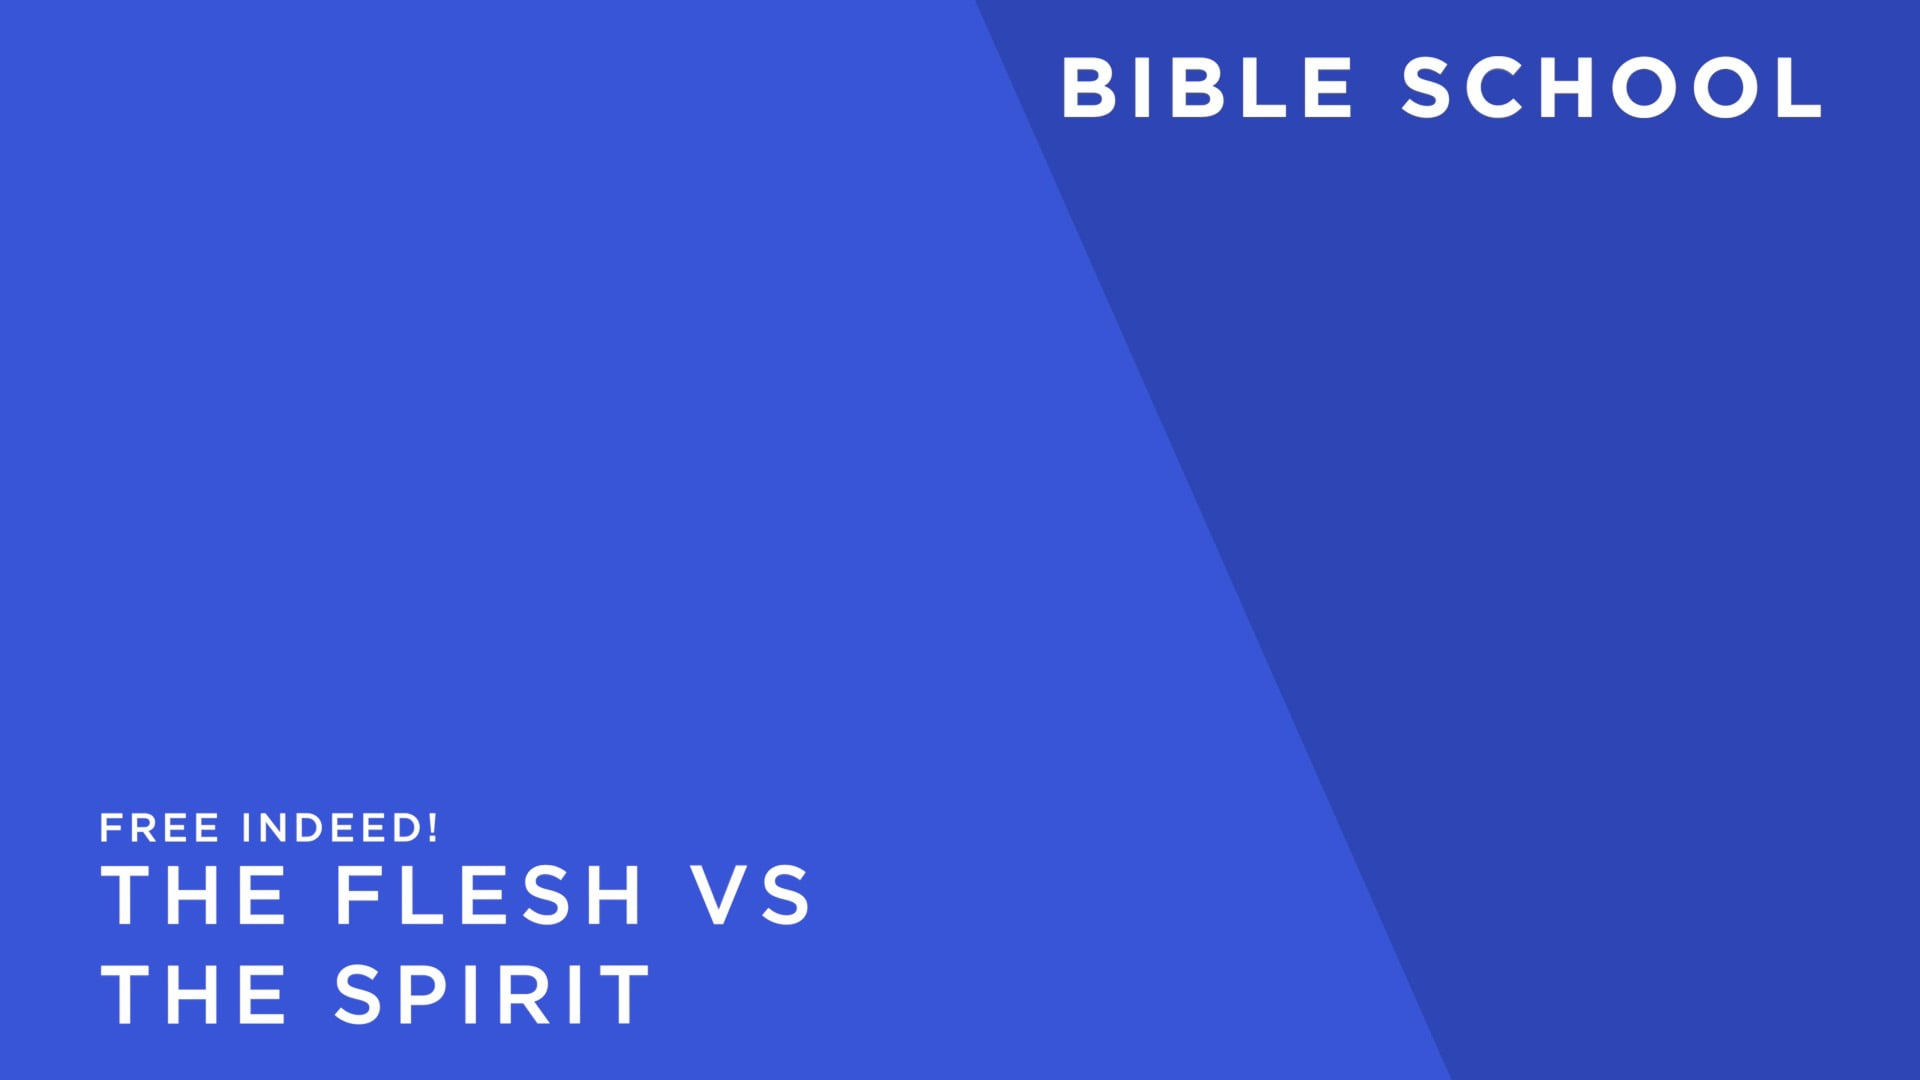 Free Indeed! [7] The Flesh vs The Spirit